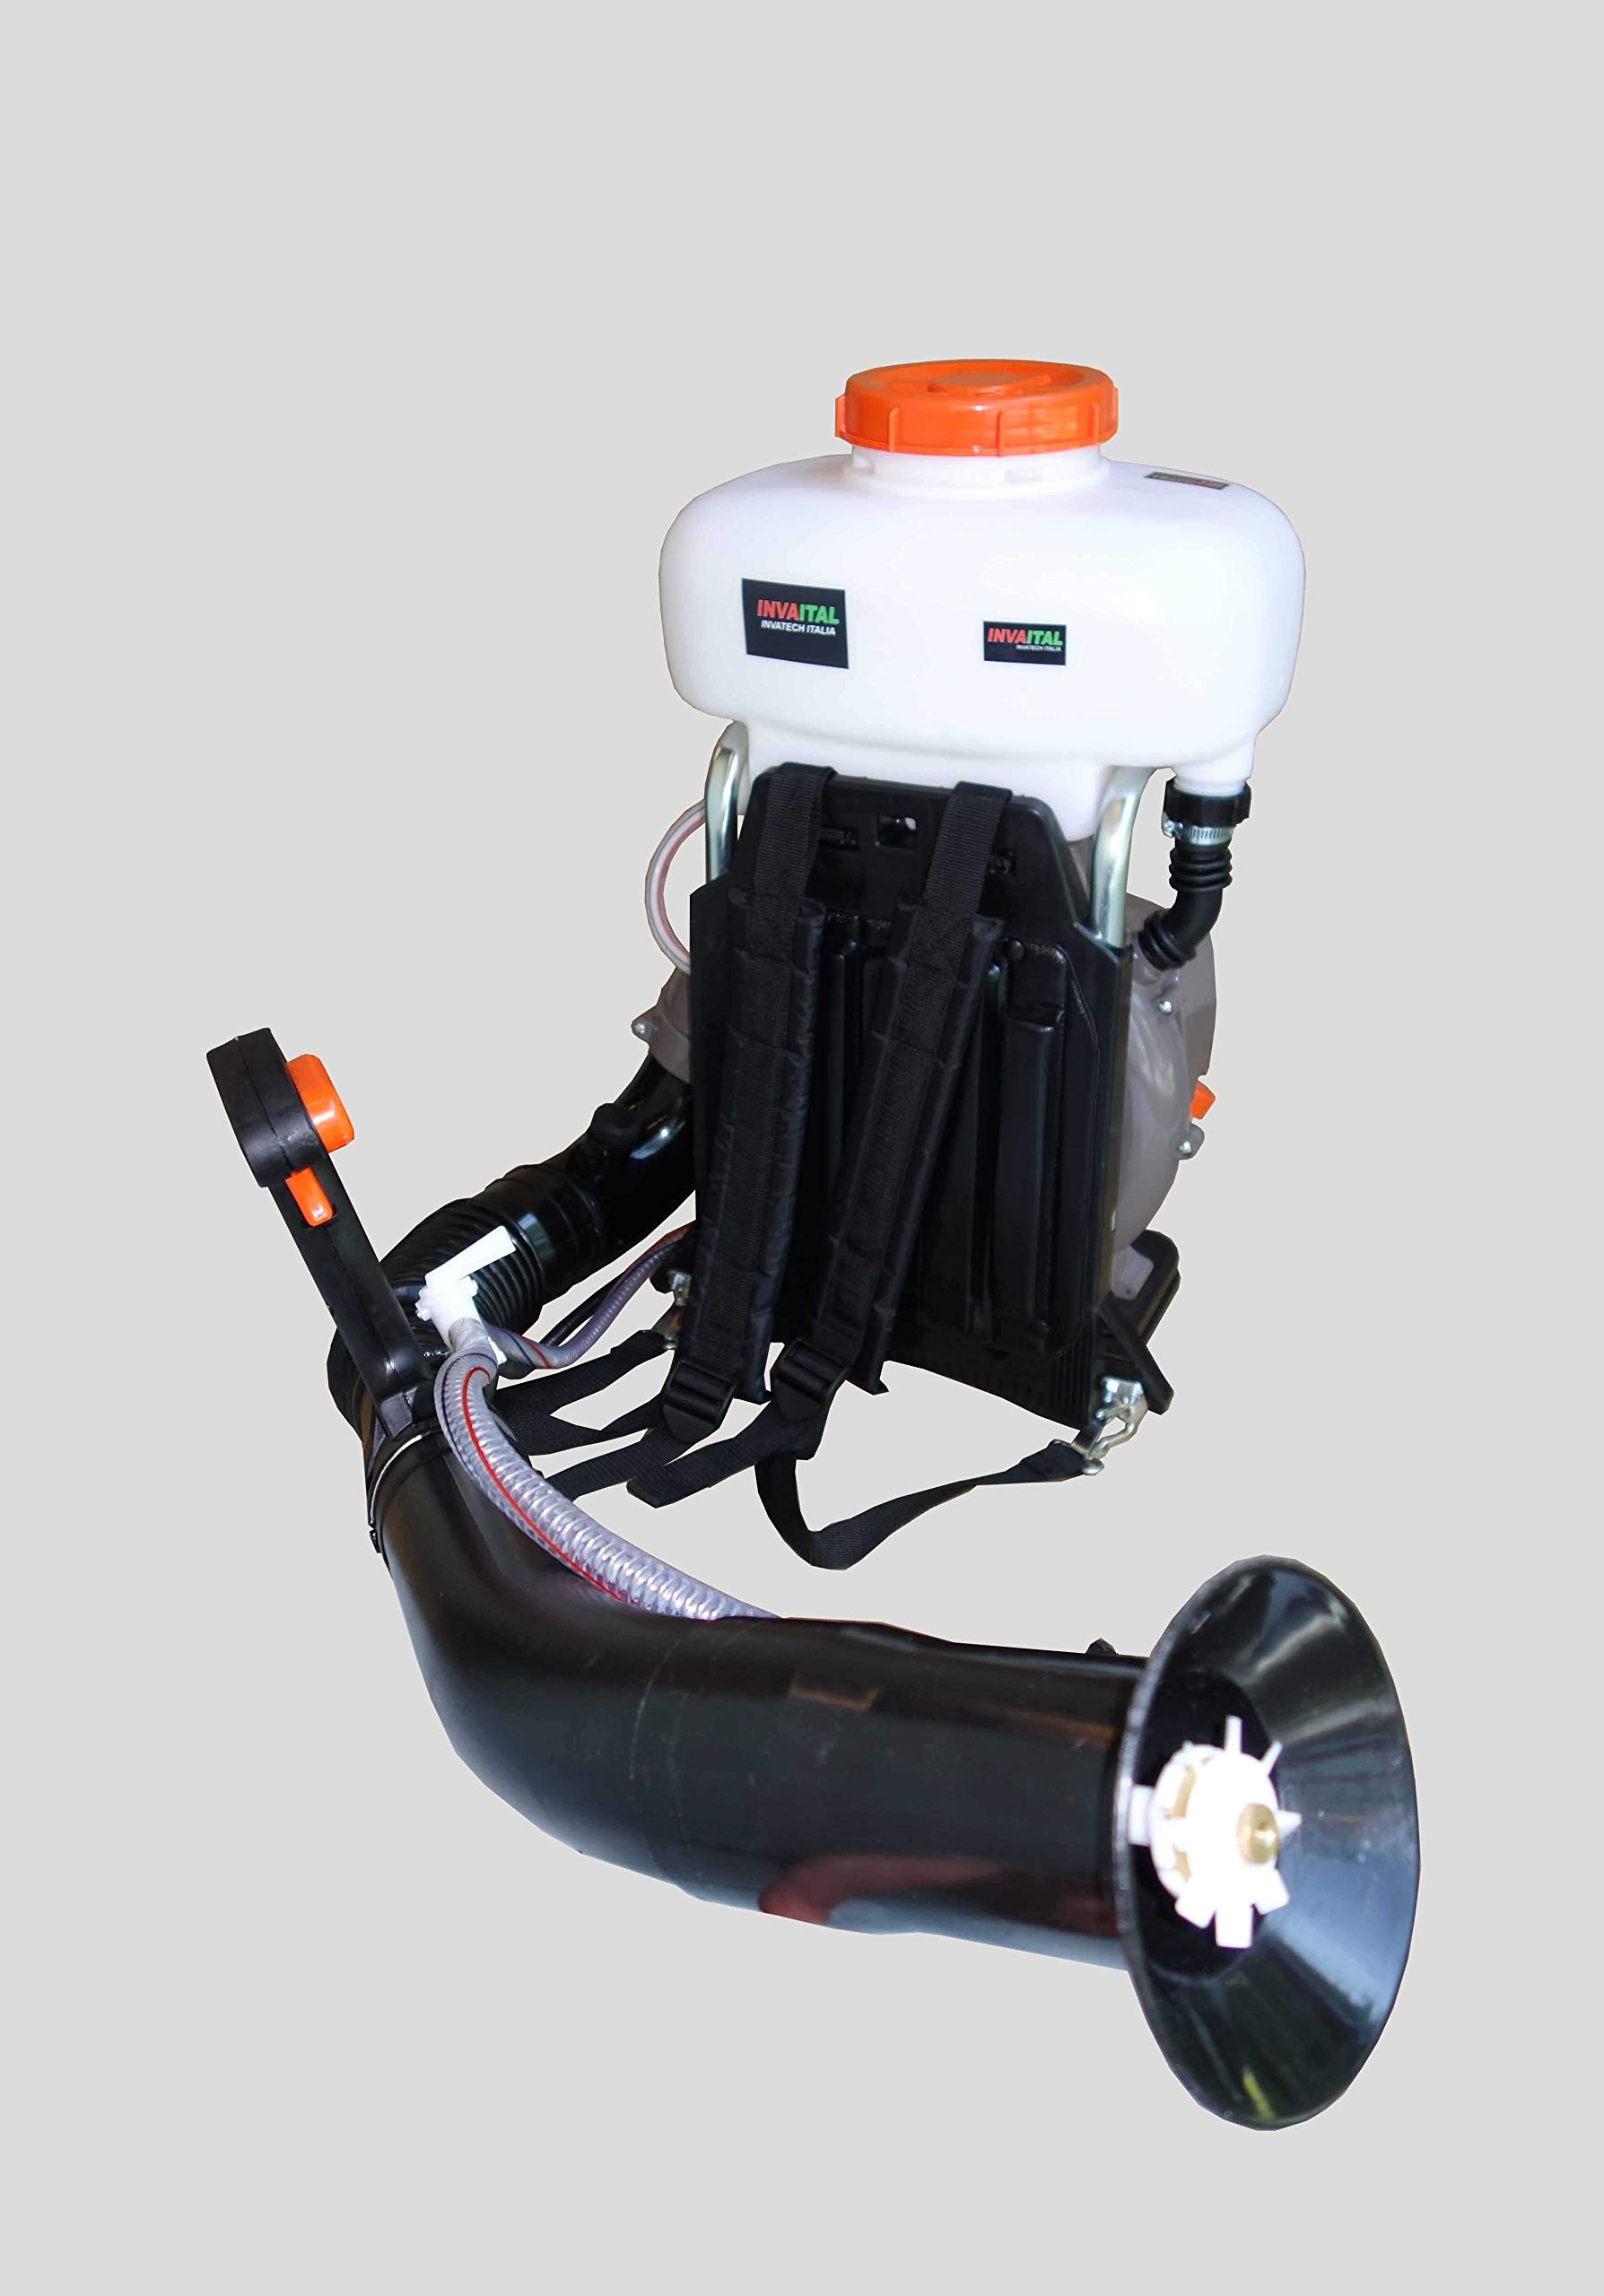 Invatech Italia New Model: 868 Mister Duster Mosquito Sprayer Mosquito Fogger Backpack Sprayer Cold Fogger by Invatech Italia (Image #2)